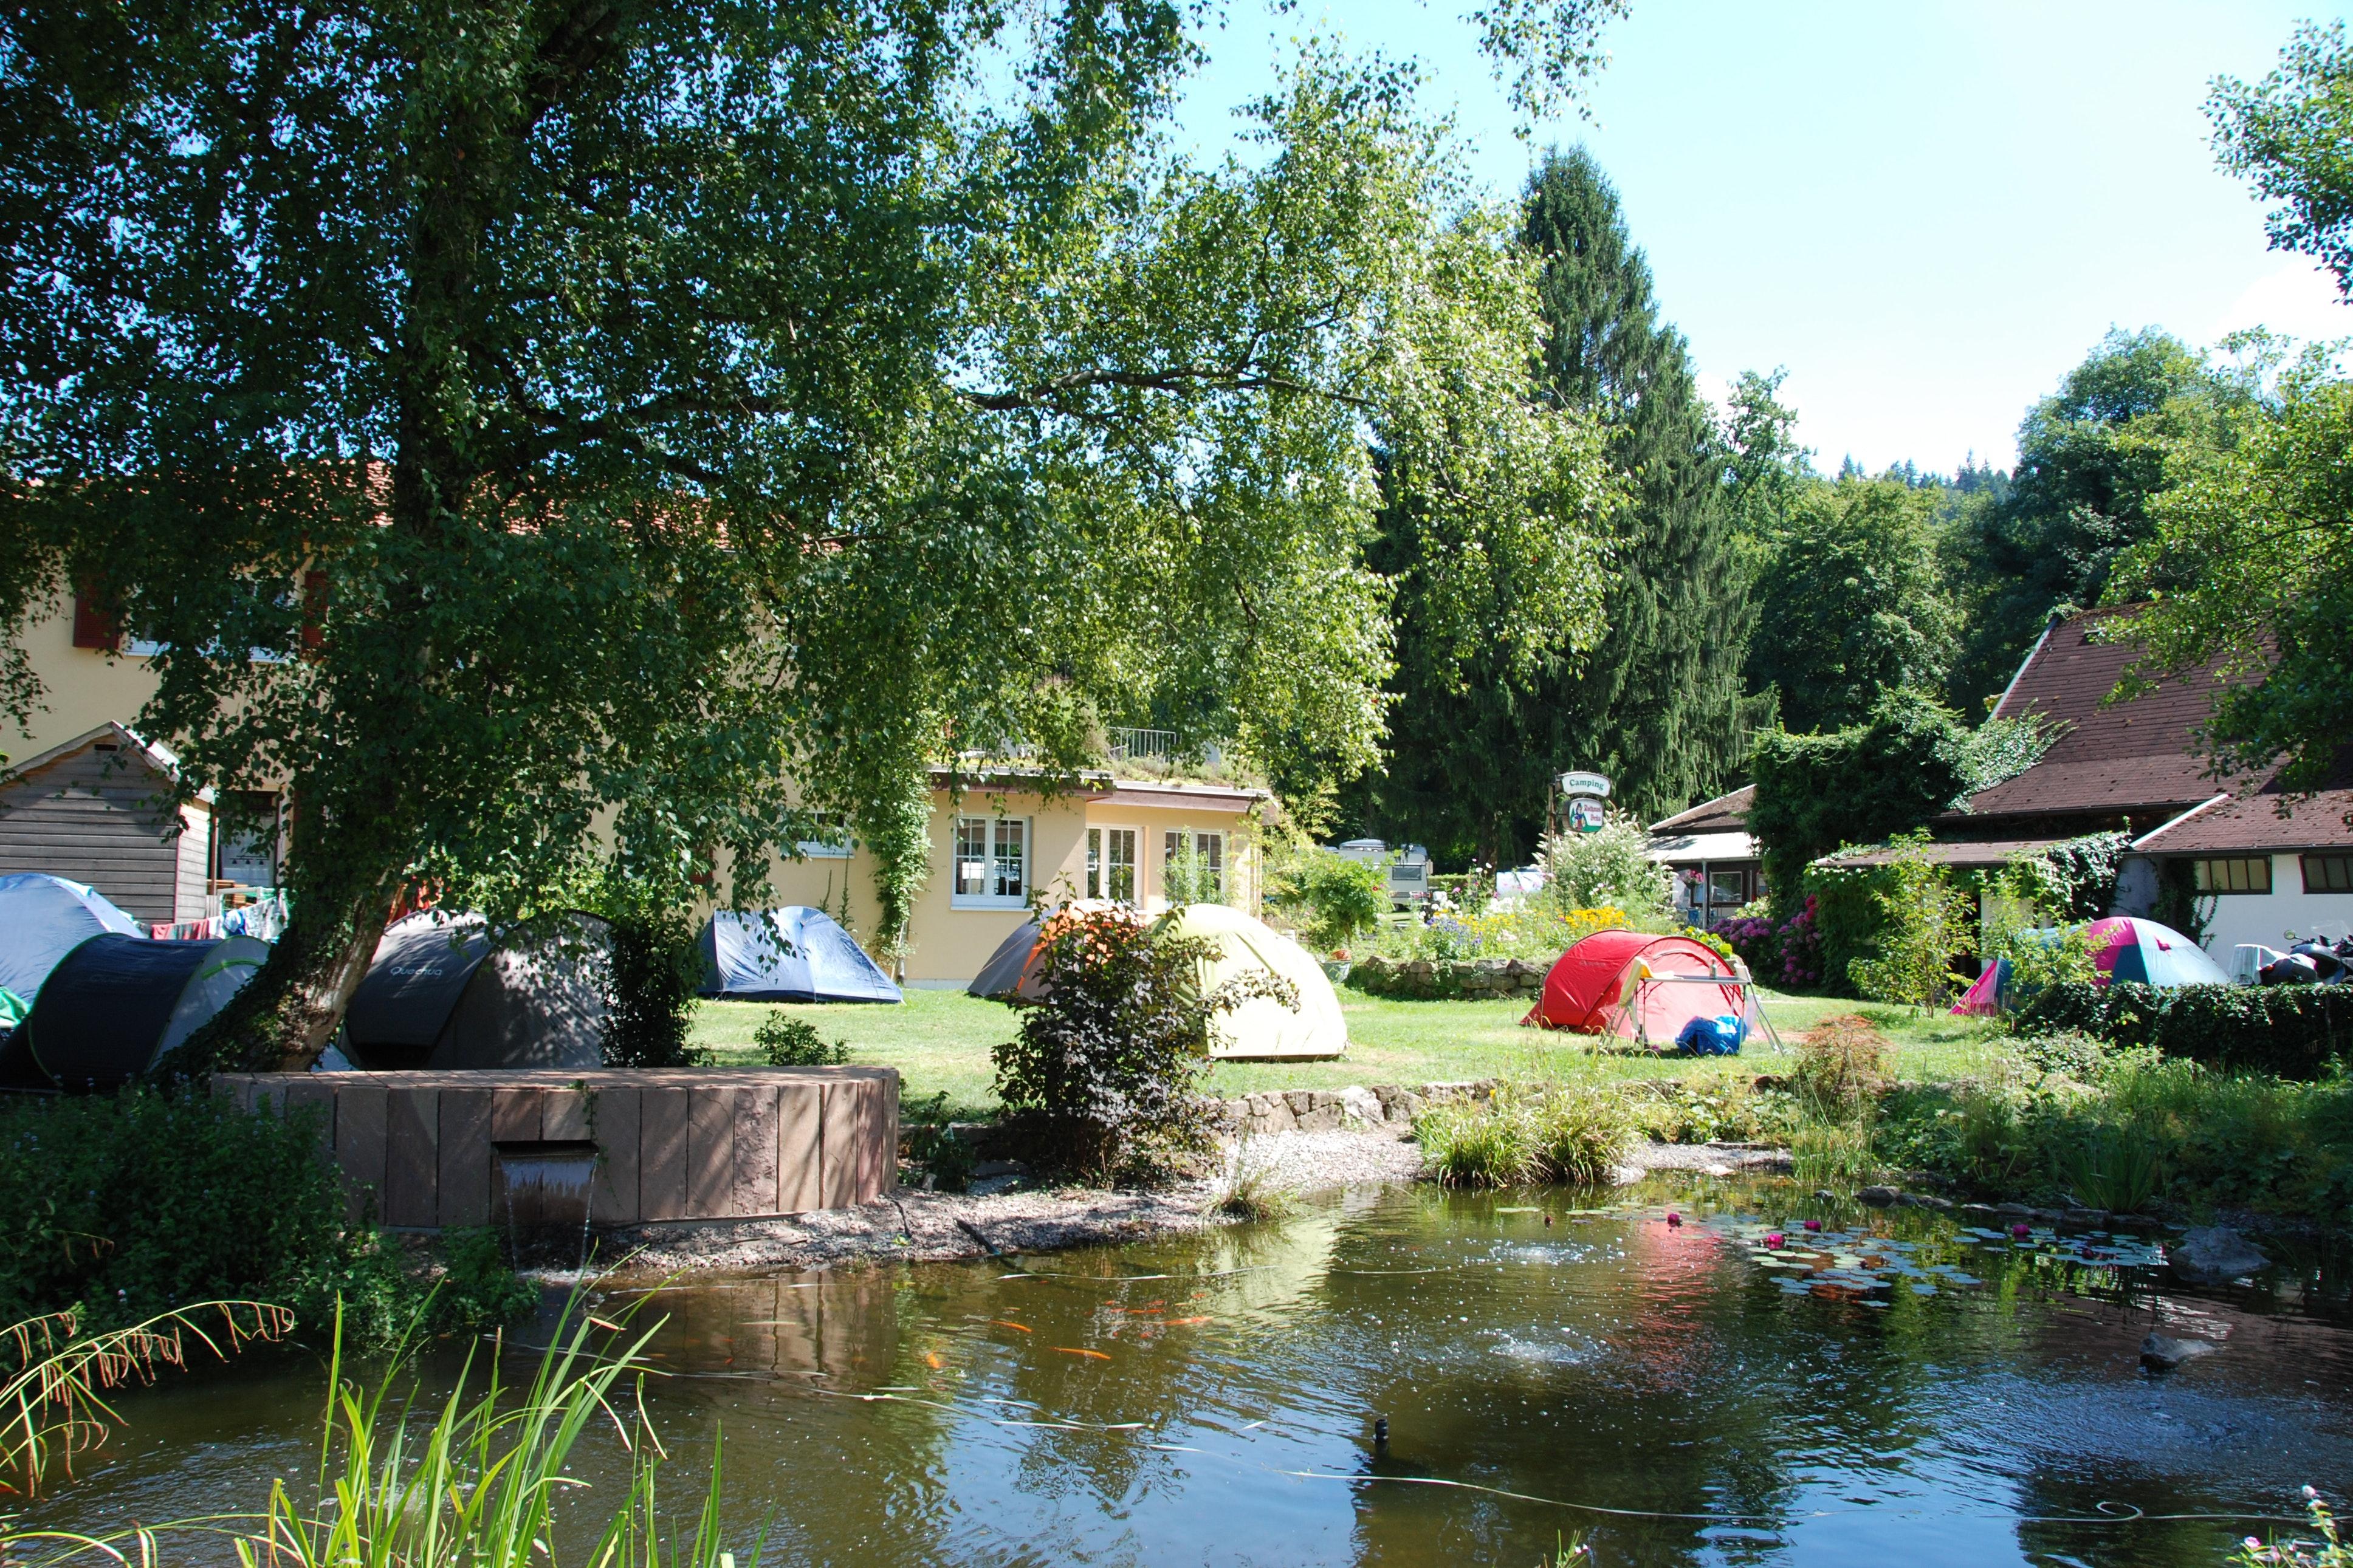 campingplatz freiburg im breisgau